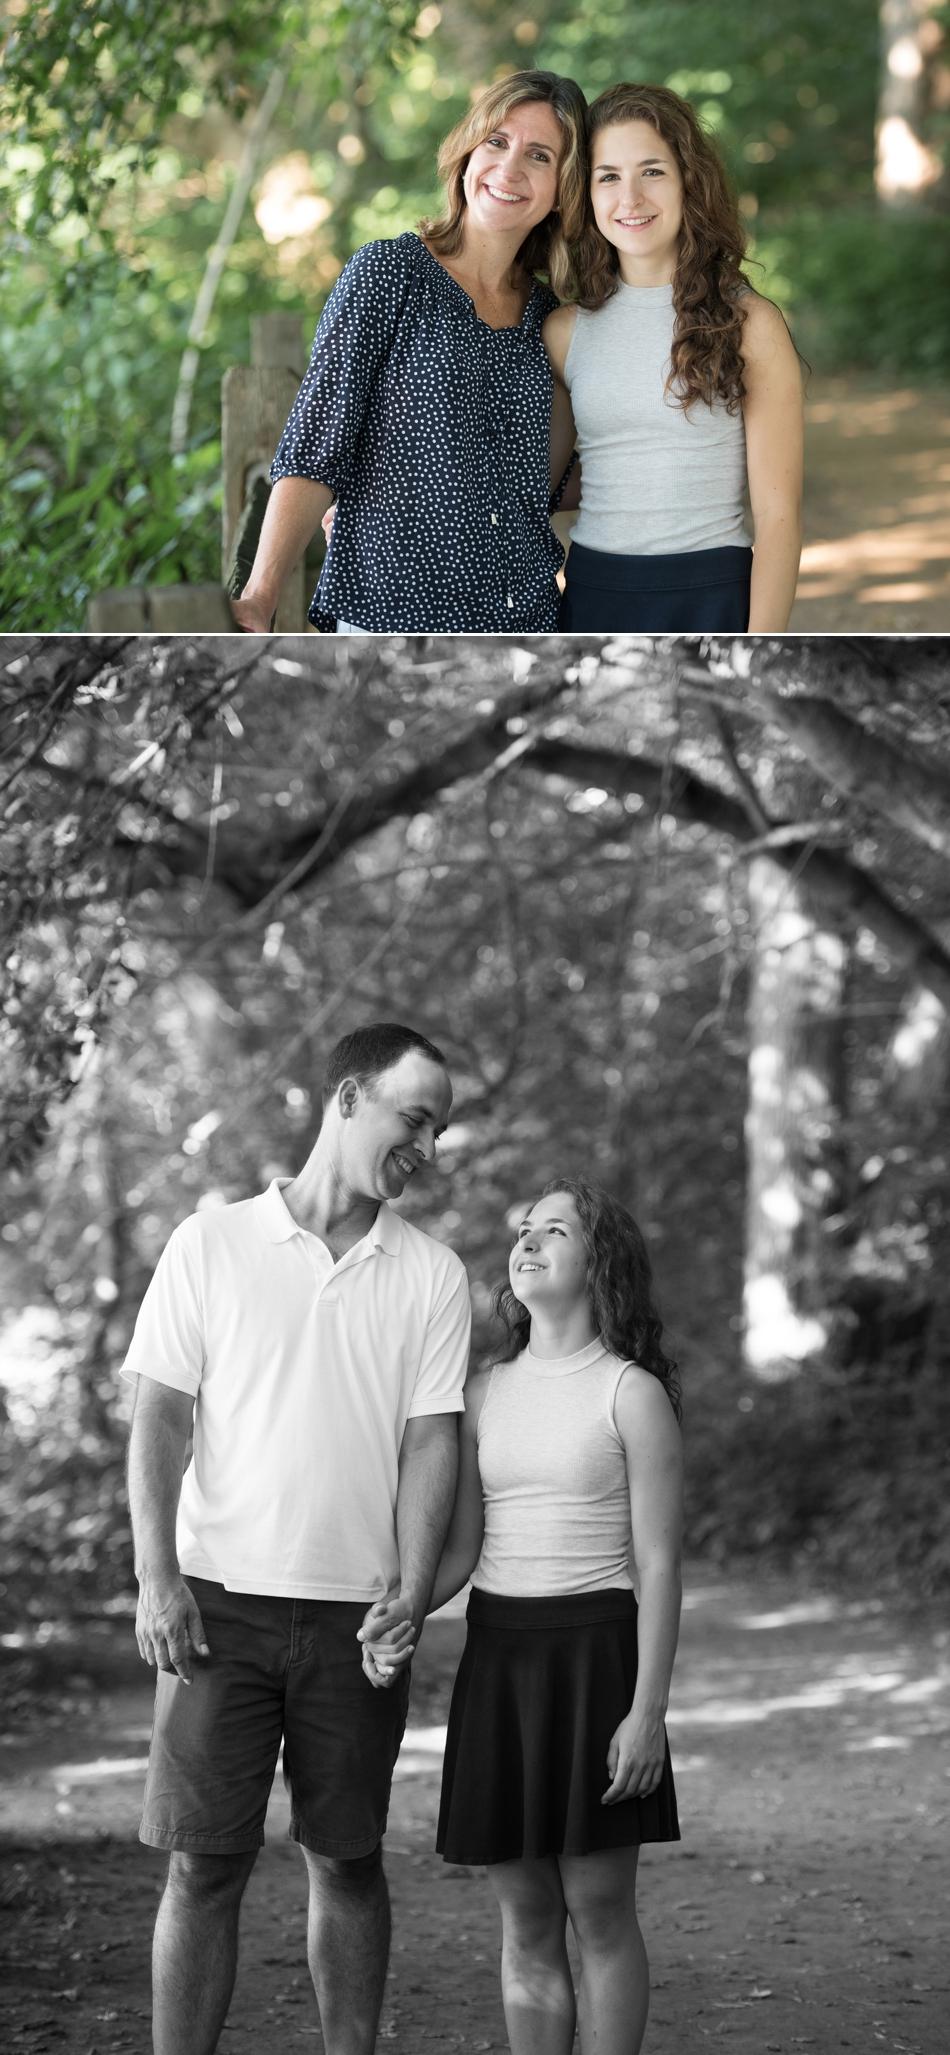 Northern Virginia Family Photographer 7.jpg